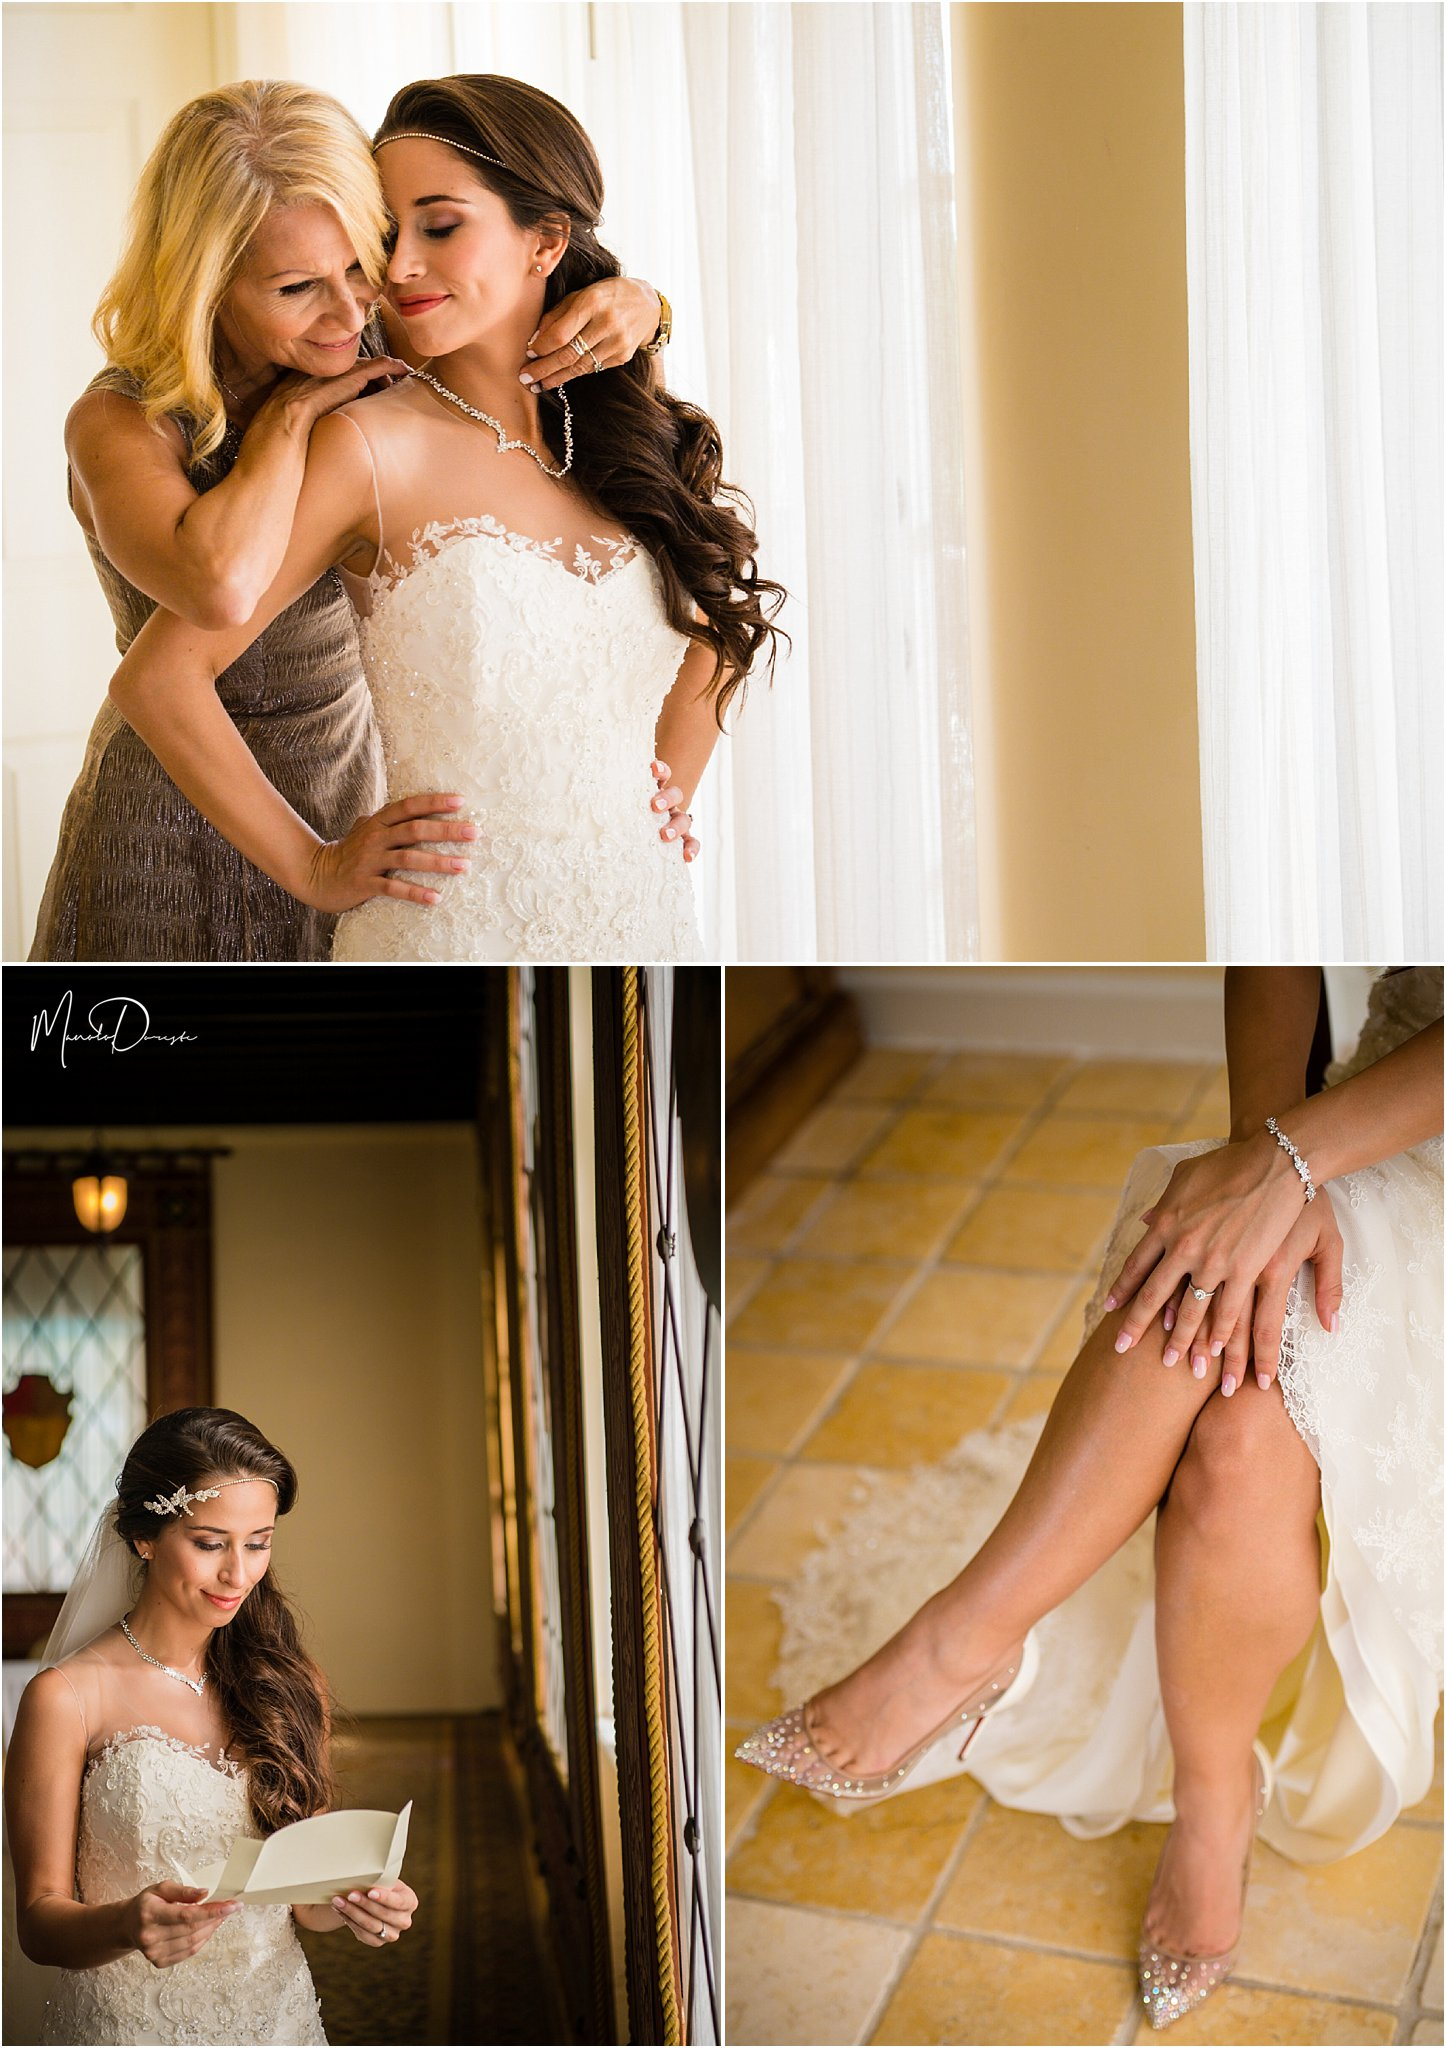 0154_ManoloDoreste_InFocusStudios_Wedding_Family_Photography_Miami_MiamiPhotographer.jpg